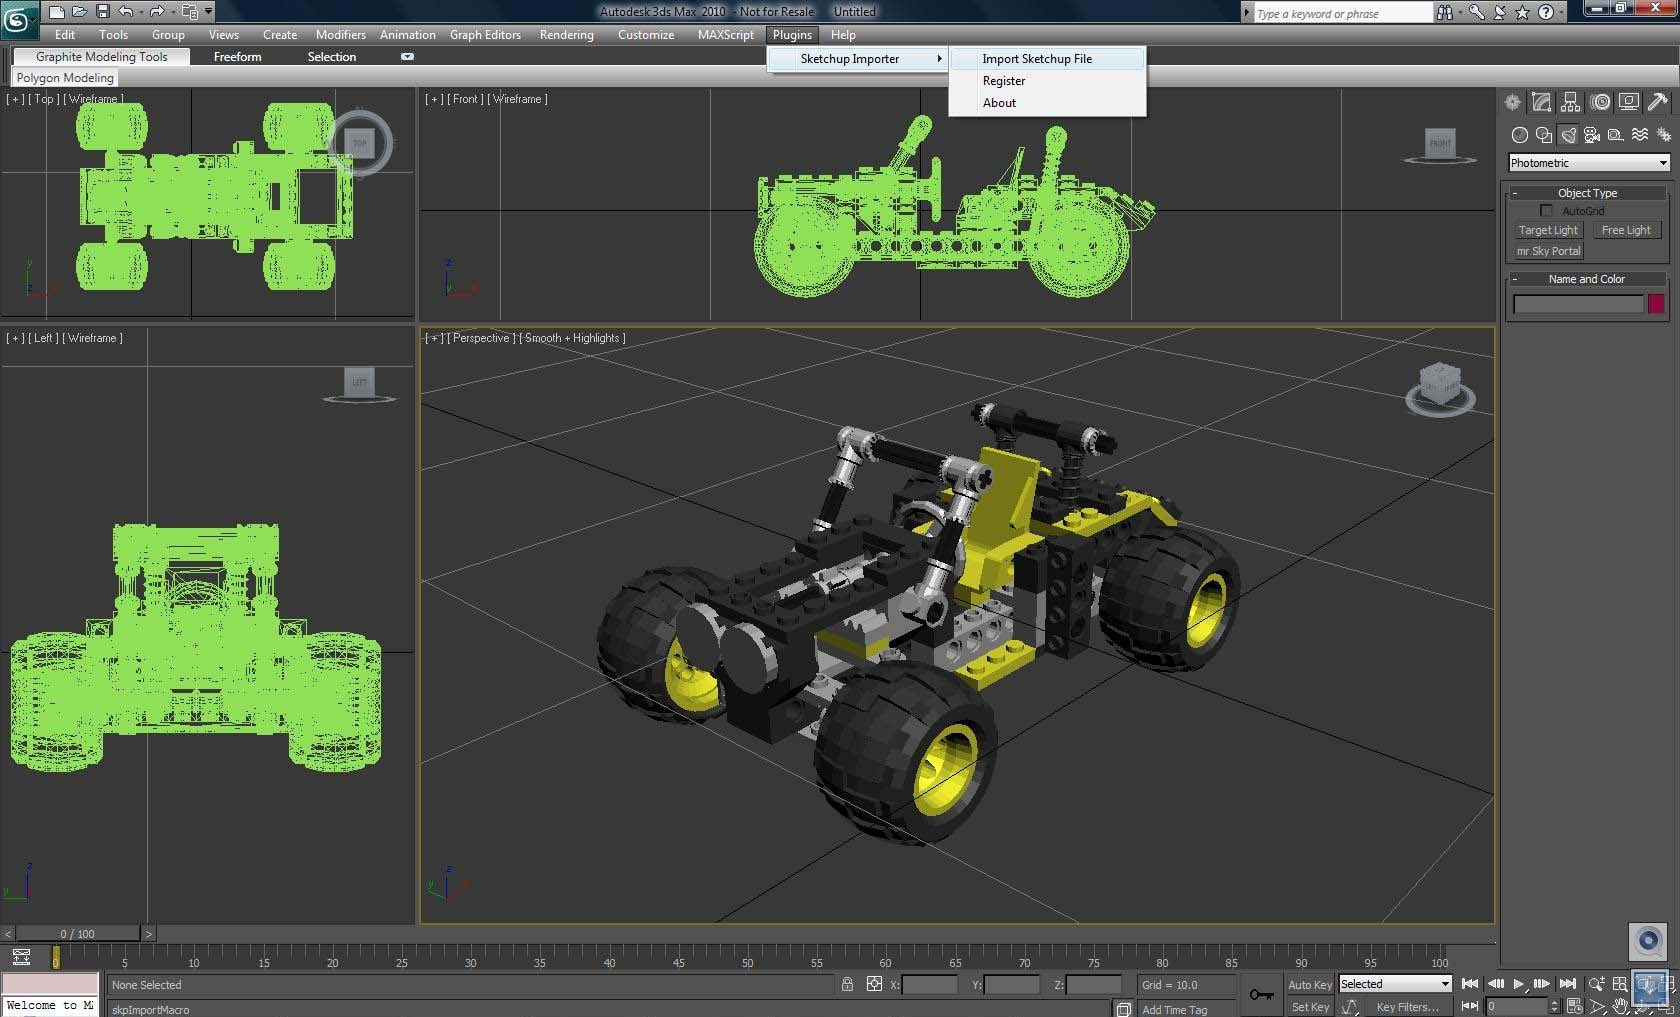 Autodesk 3ds max скачать бесплатно autodesk 3ds max 2014 16. 0.